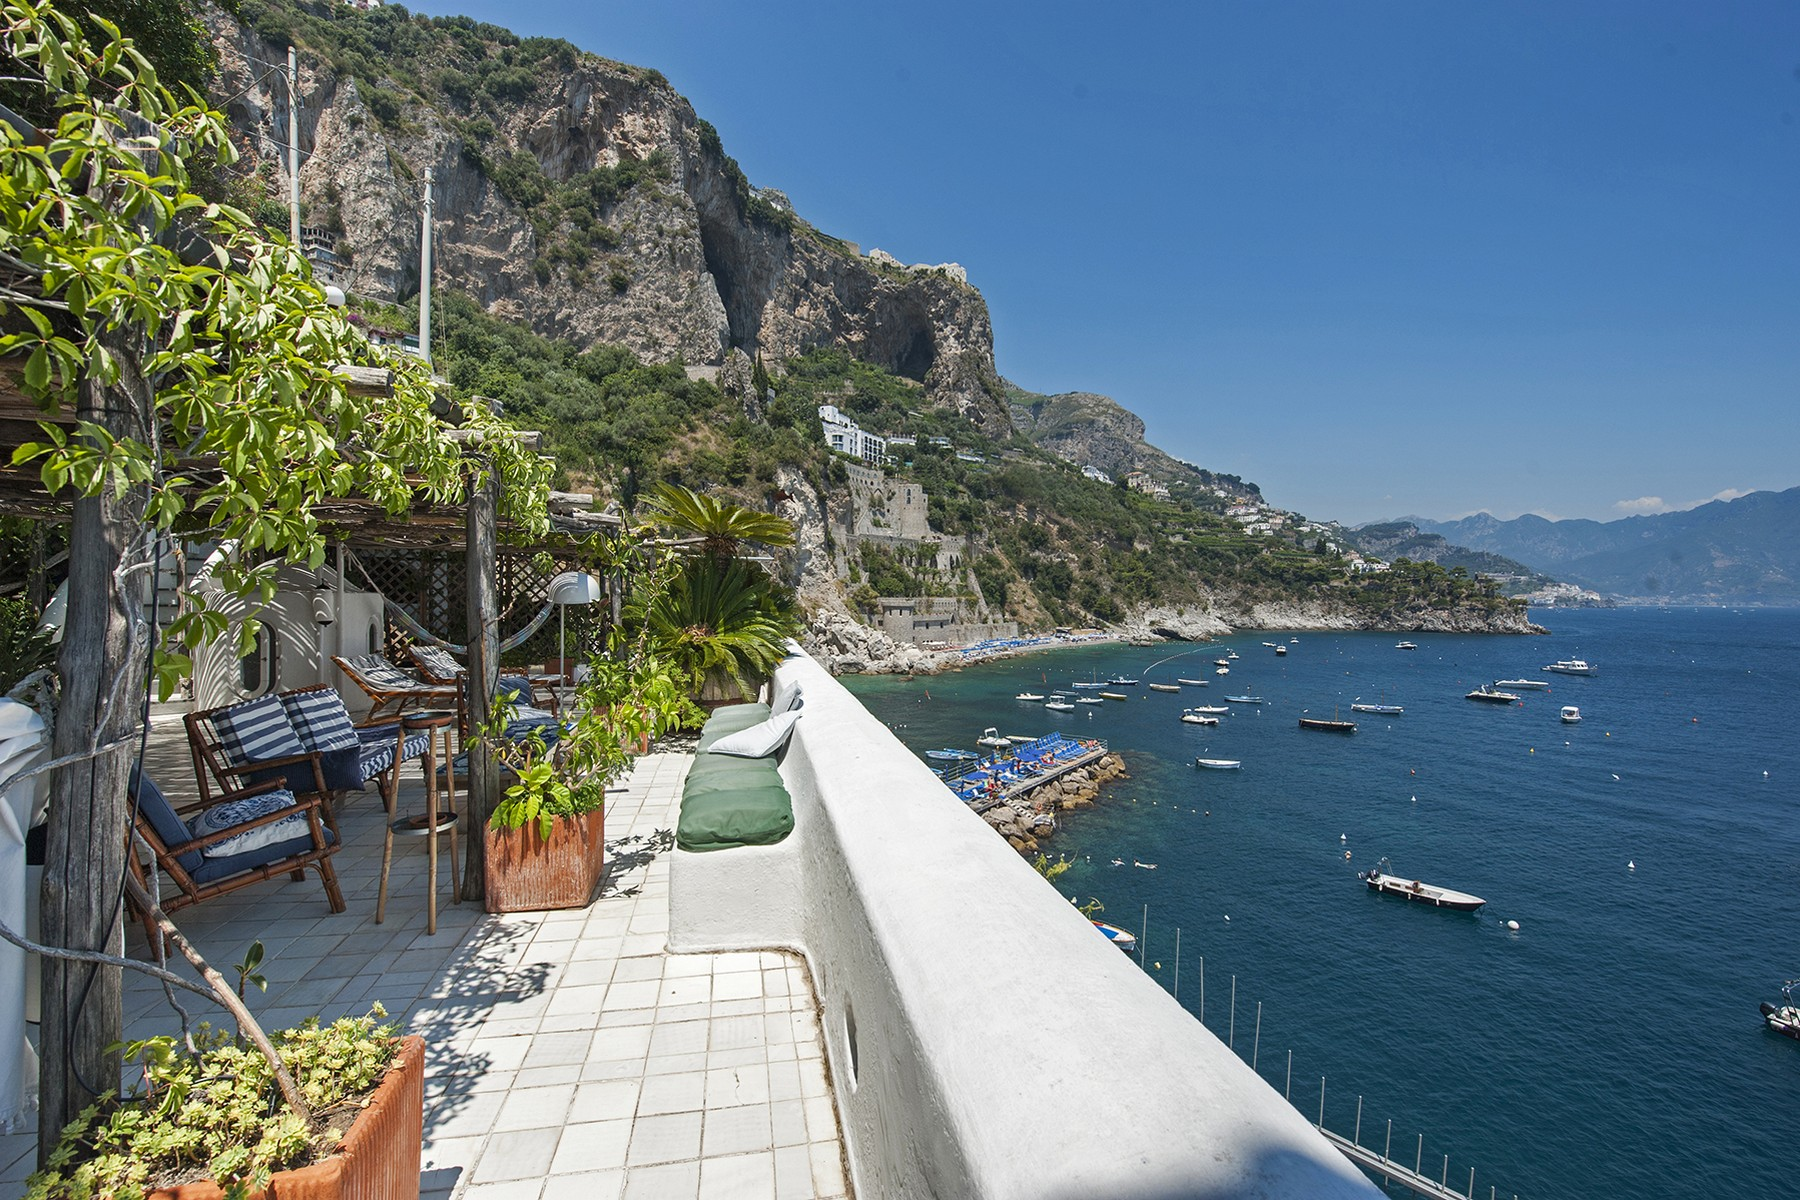 Townhouse for Sale at Villa Chandon Via Marina Conca Dei Marini, Salerno 84010 Italy